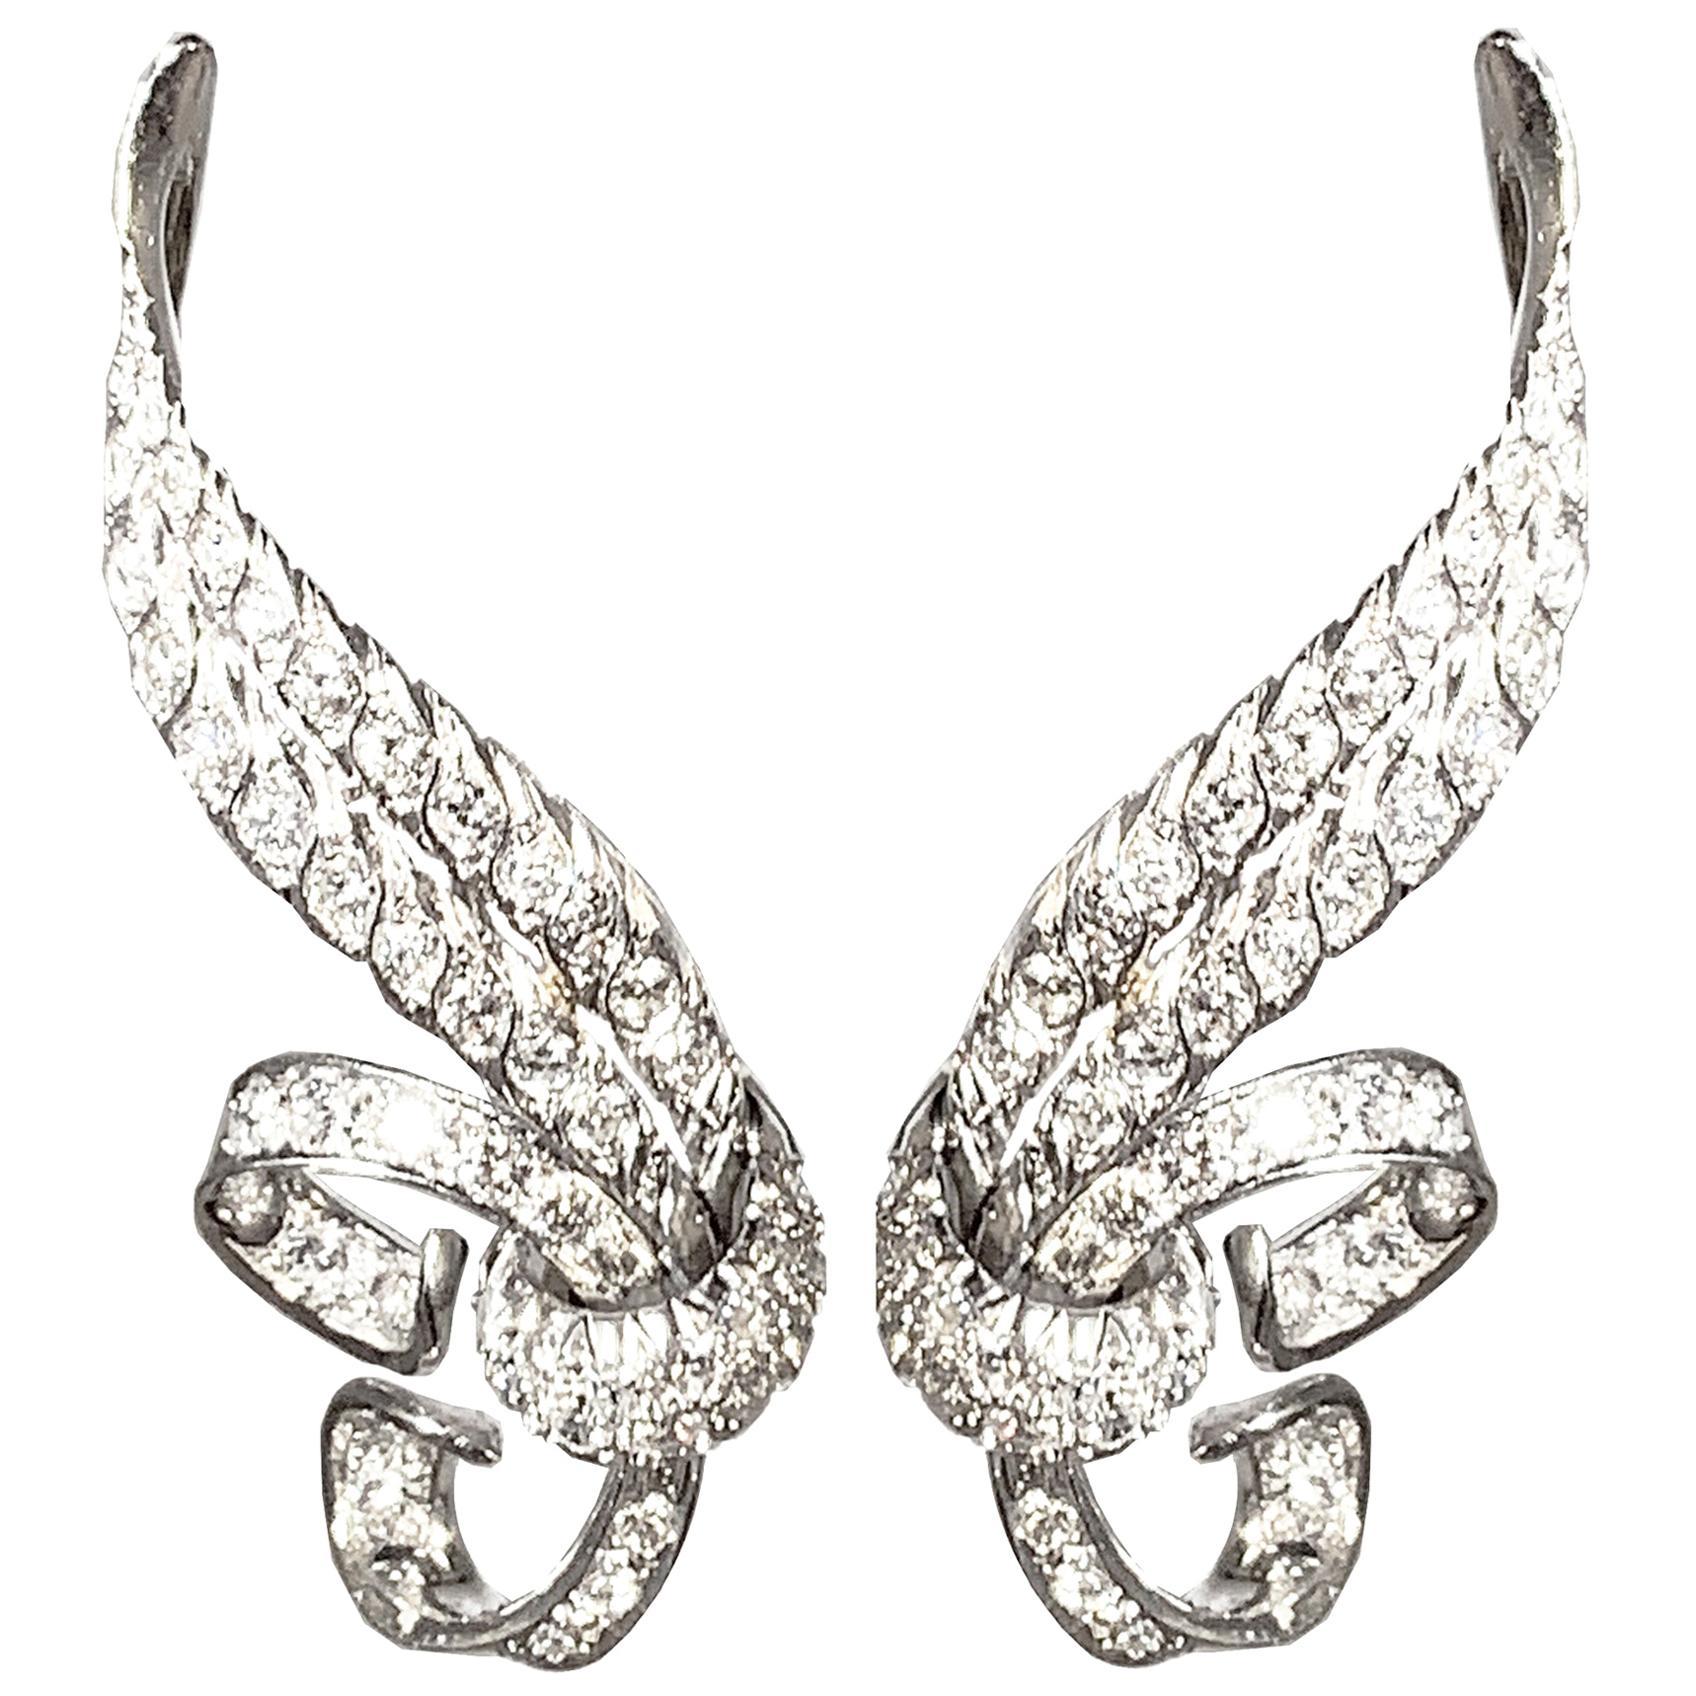 Vintage Diamond and White Gold Love Knot Earrings Italian Dolce Vita  Design